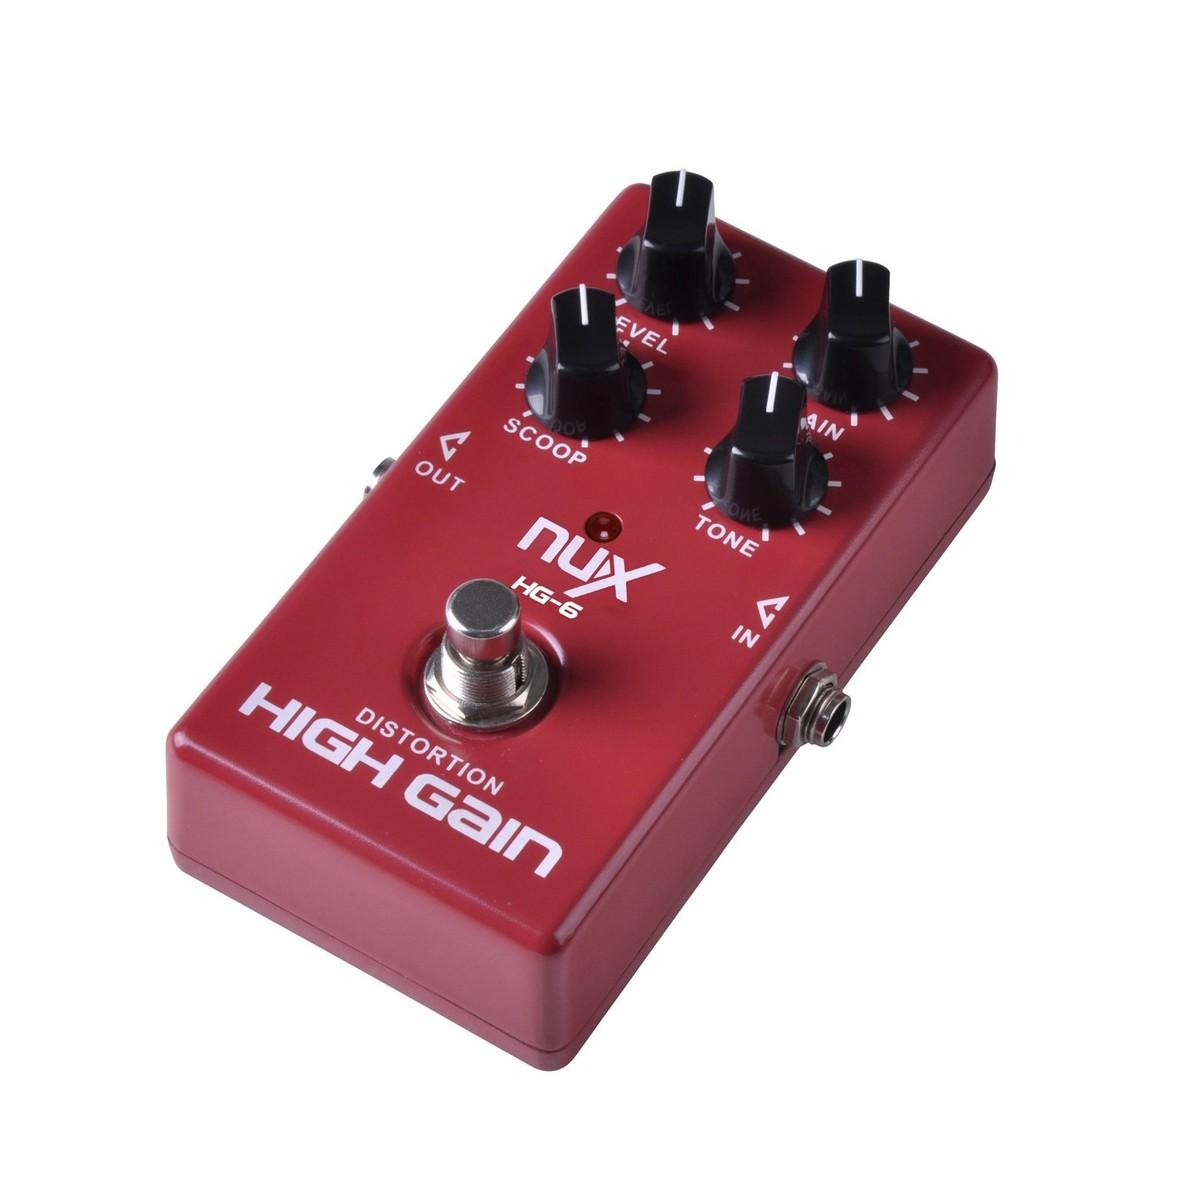 nux hg 6 high gain distortion guitar effects pedal at. Black Bedroom Furniture Sets. Home Design Ideas